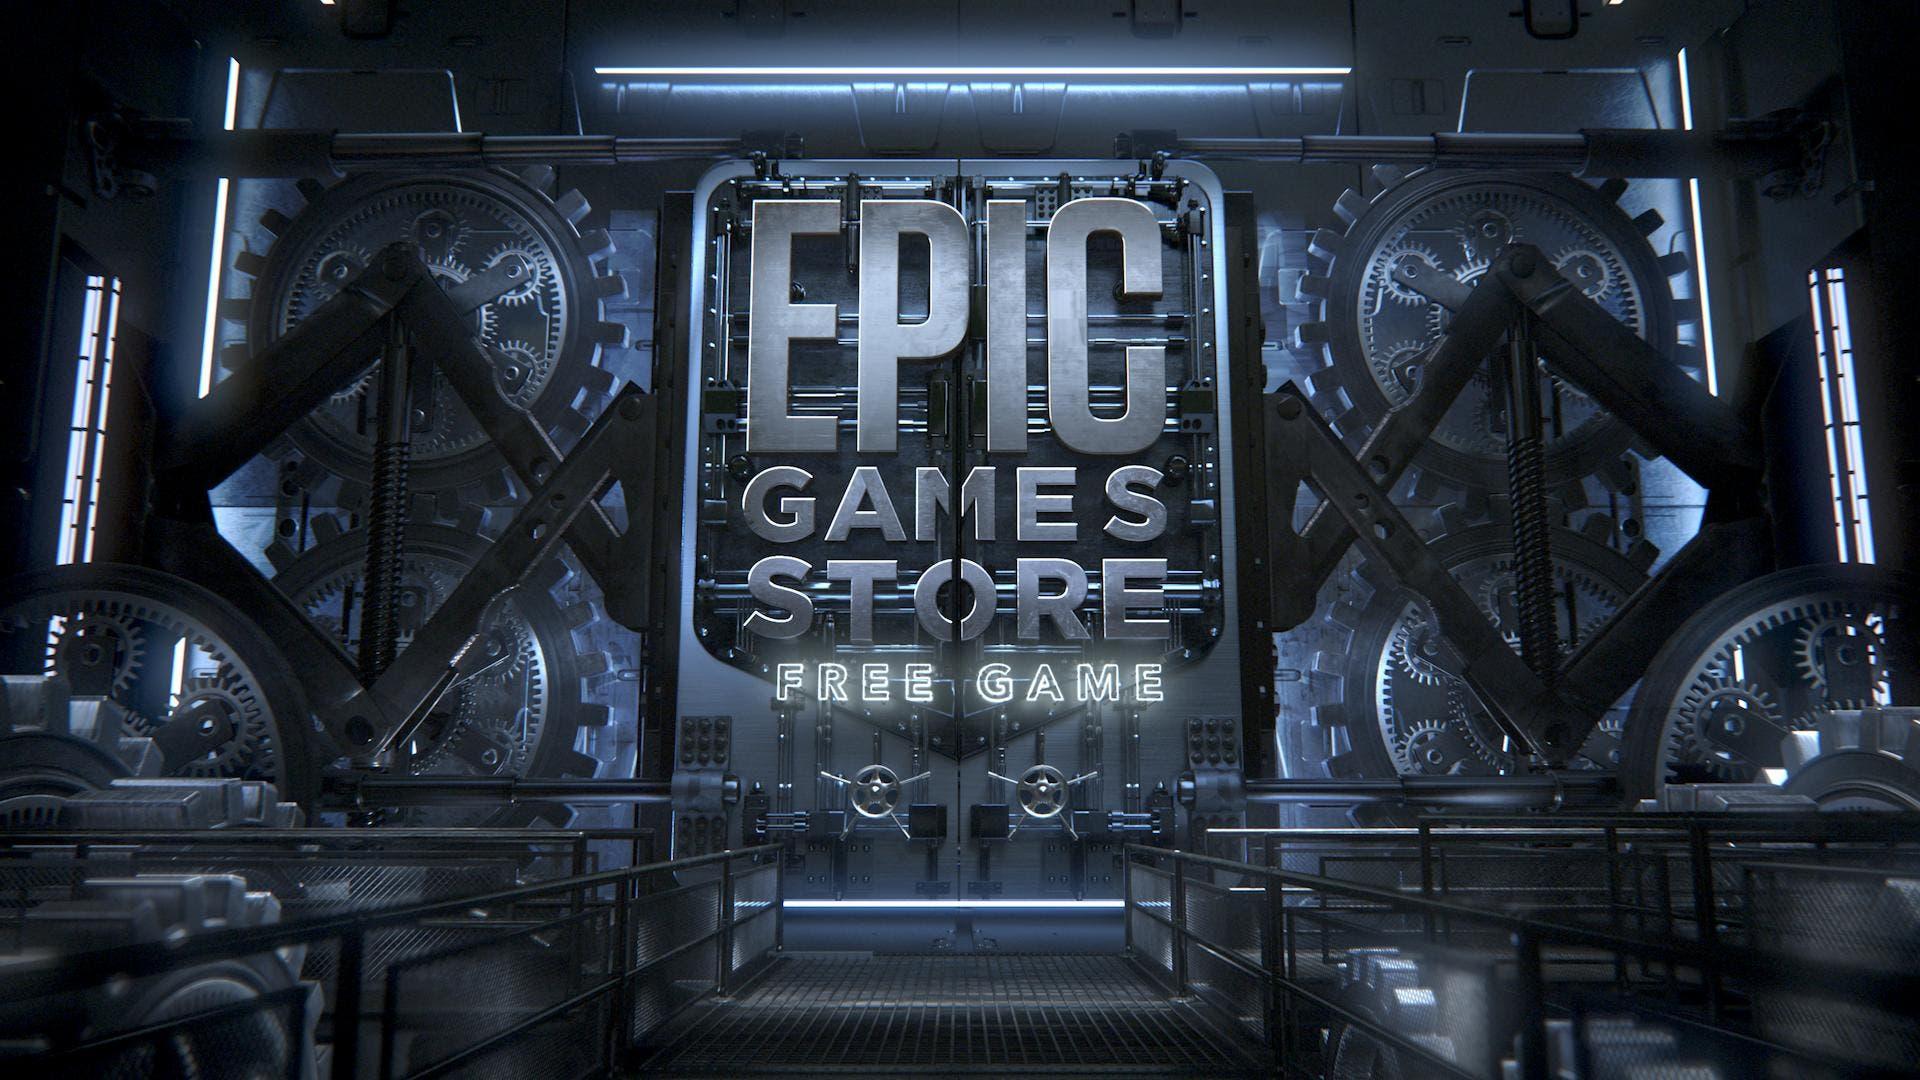 nuevo juego gratuito a la Epic Games Store